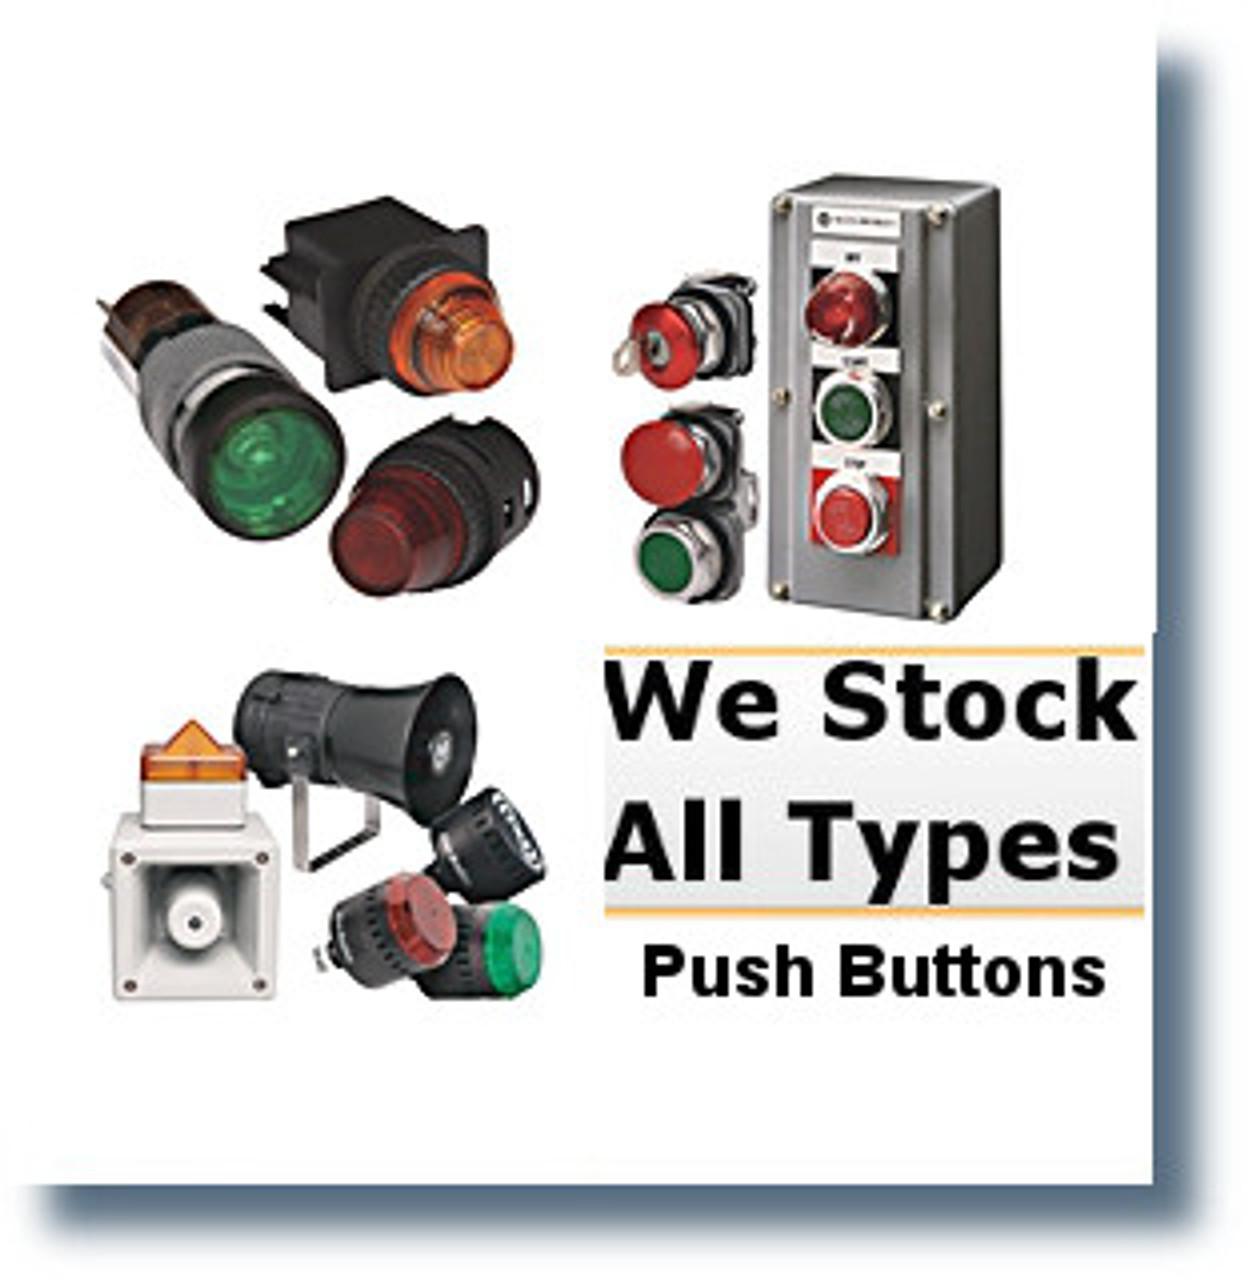 abd101nb idec pushbuttons pushbuttons 30mm pushbutton [ 1260 x 1280 Pixel ]